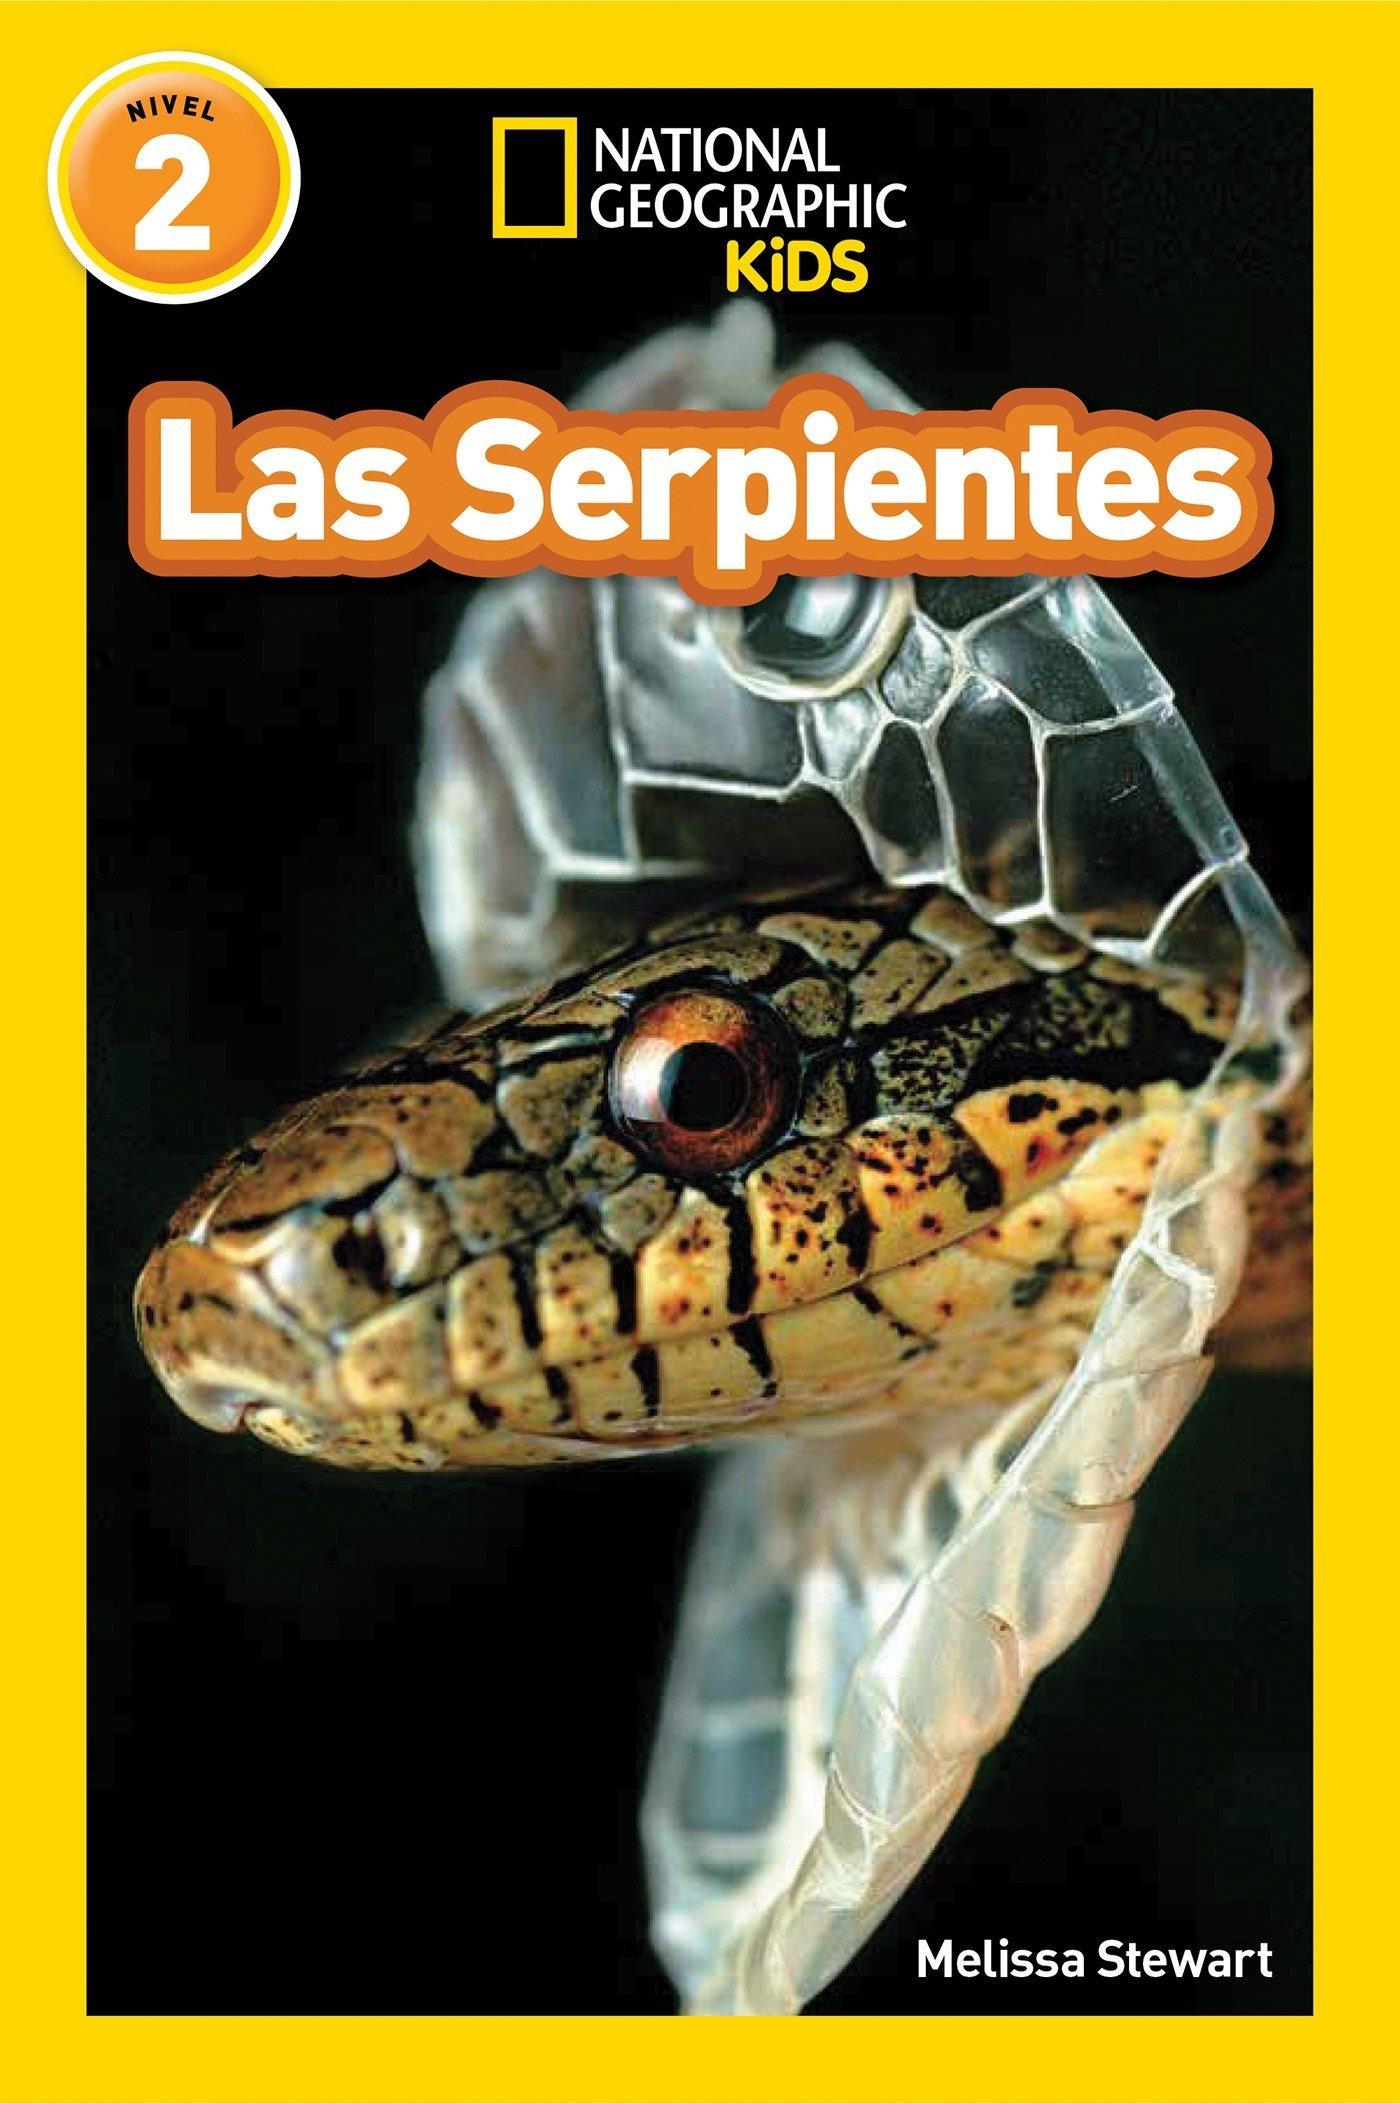 National Geographic Readers: Las Serpientes (Snakes) (Spanish Edition) pdf epub